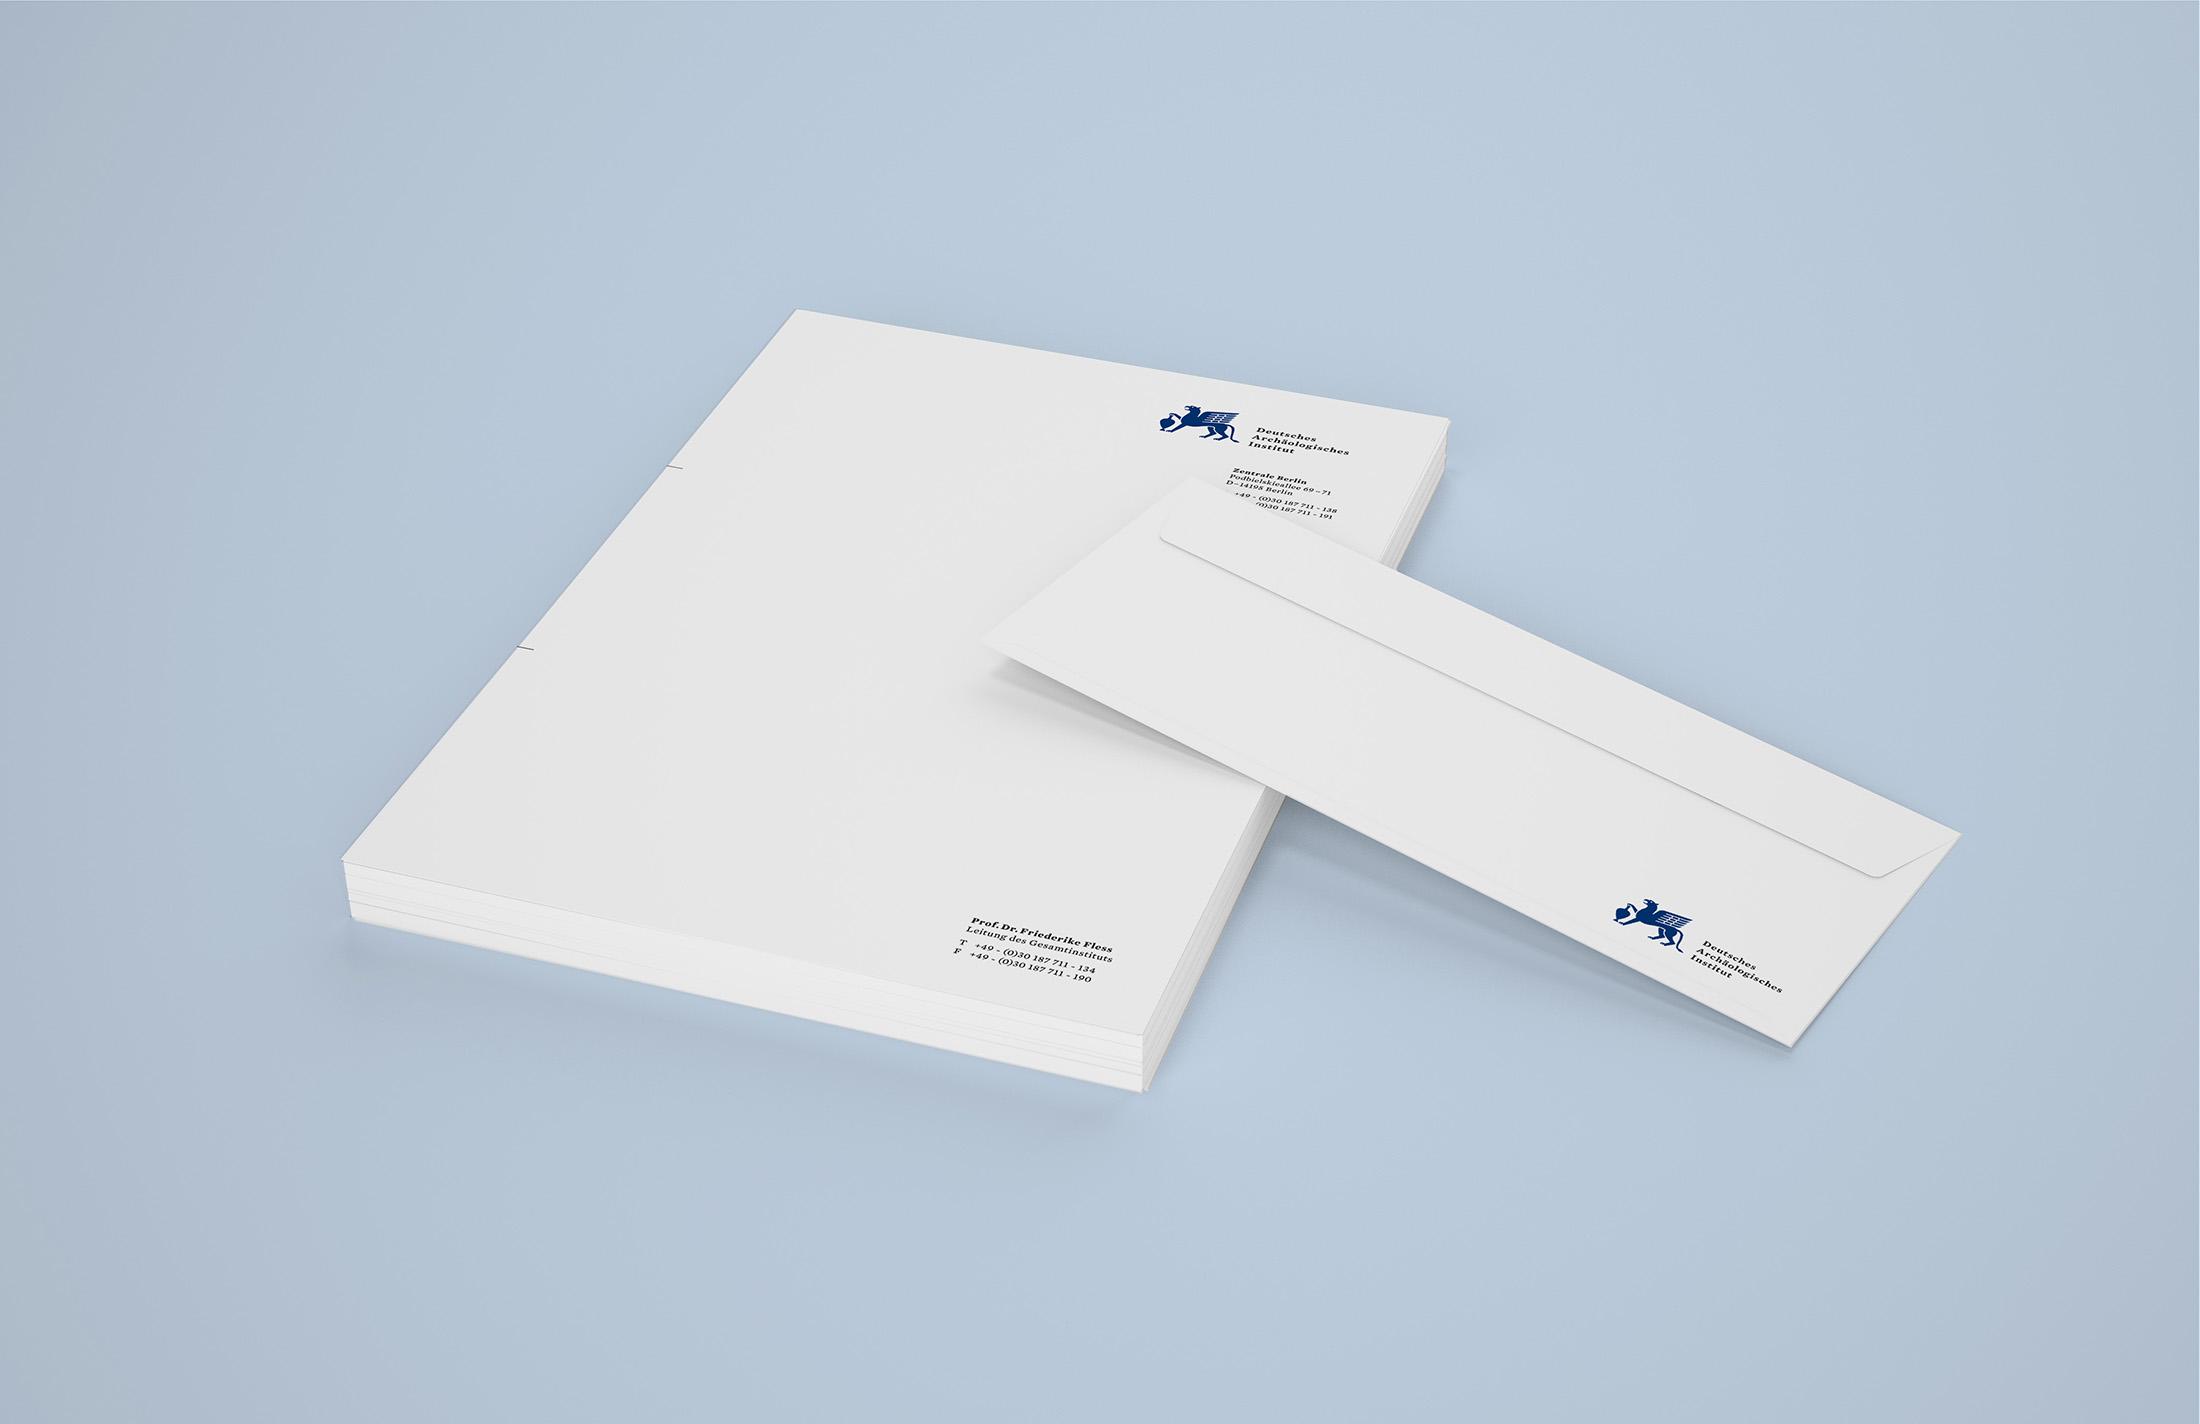 Corporate Design Potsdam DAI Briefbögen